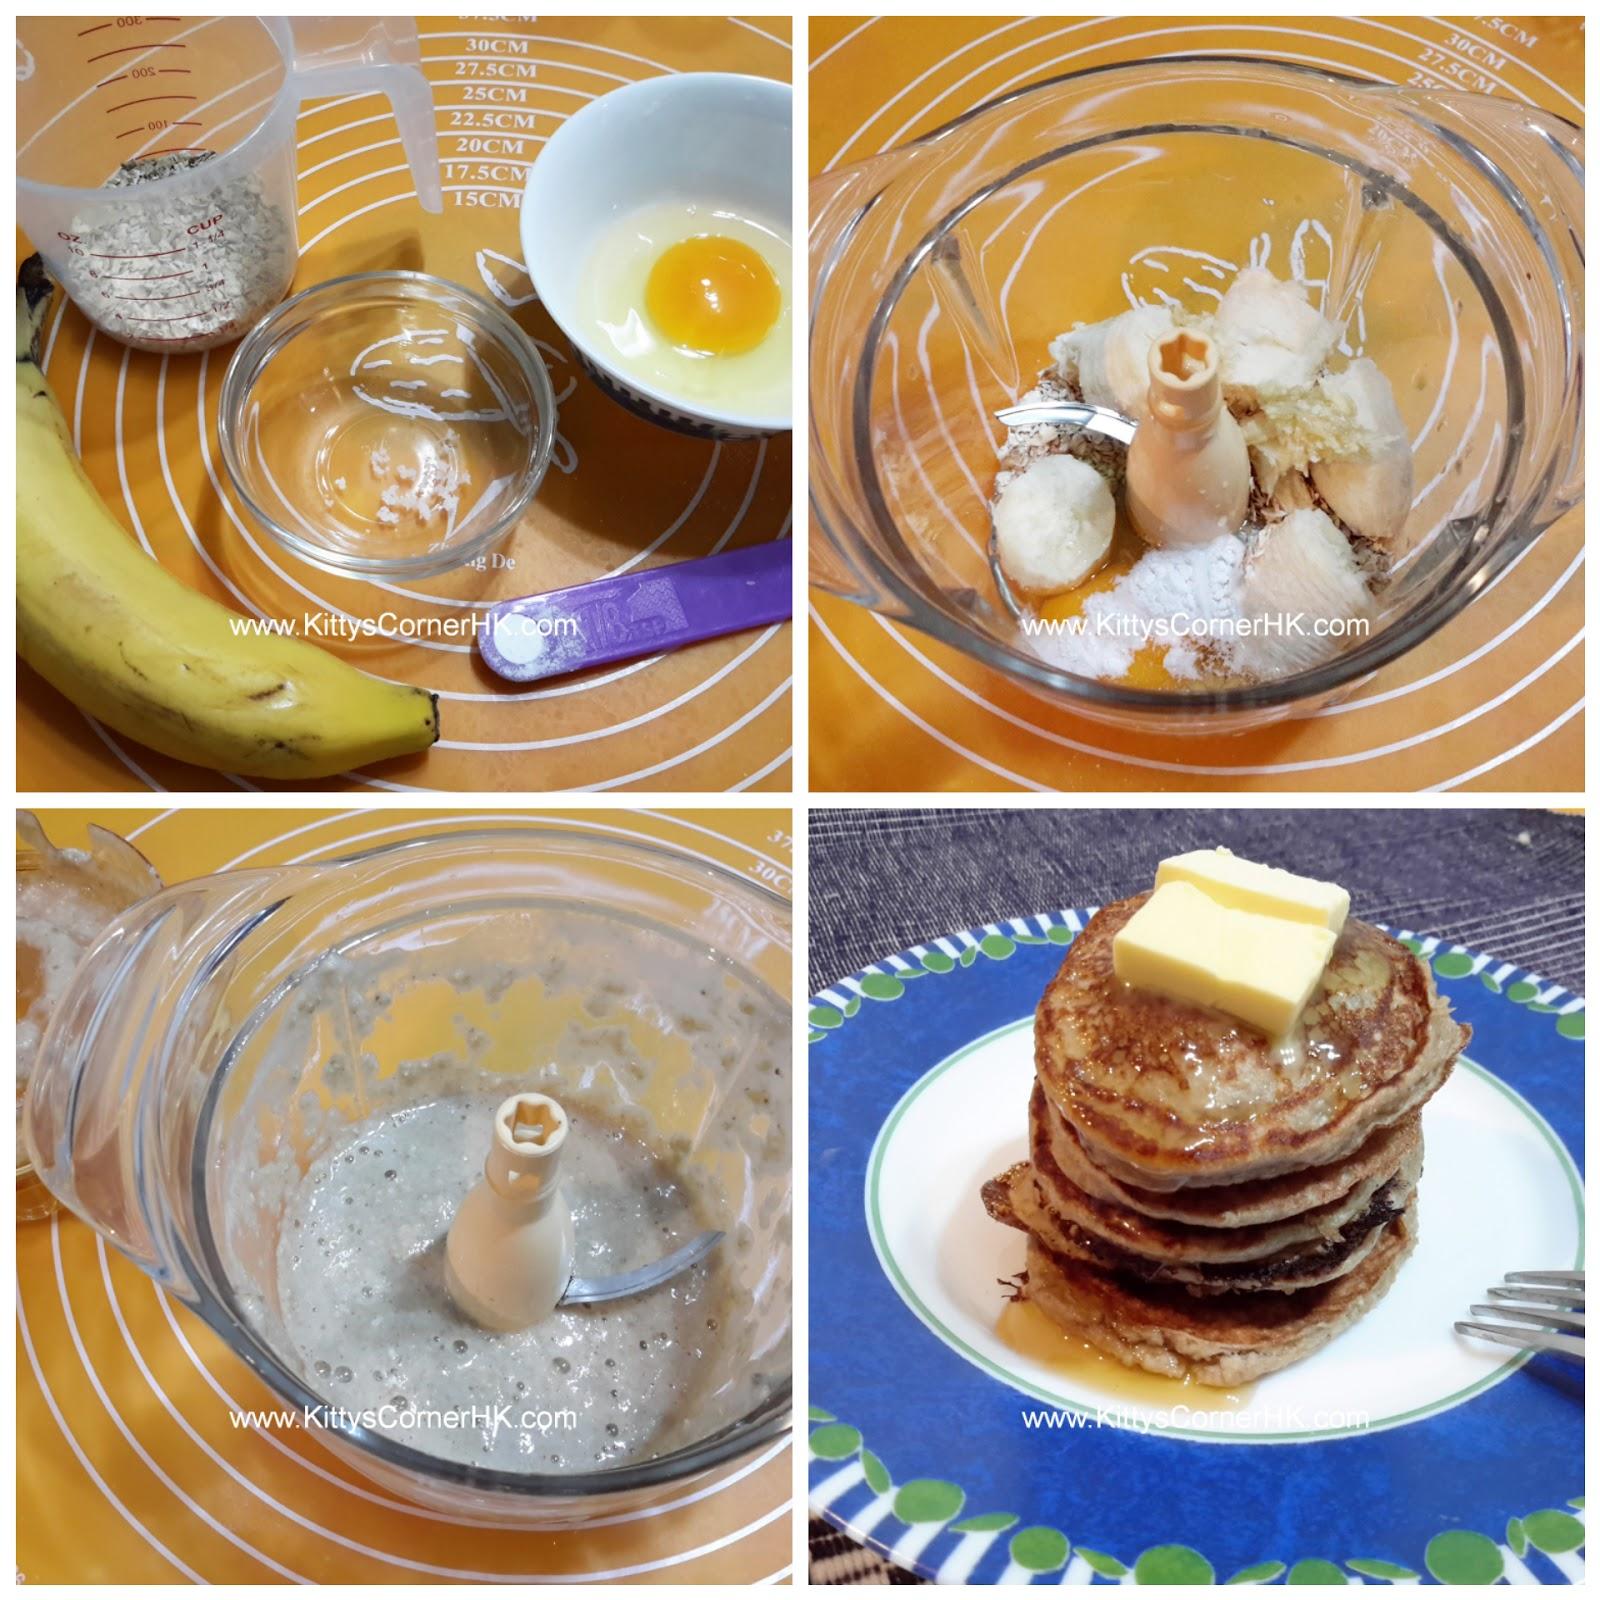 Banana Pancake DIY recipe 香蕉班戟 自家食譜